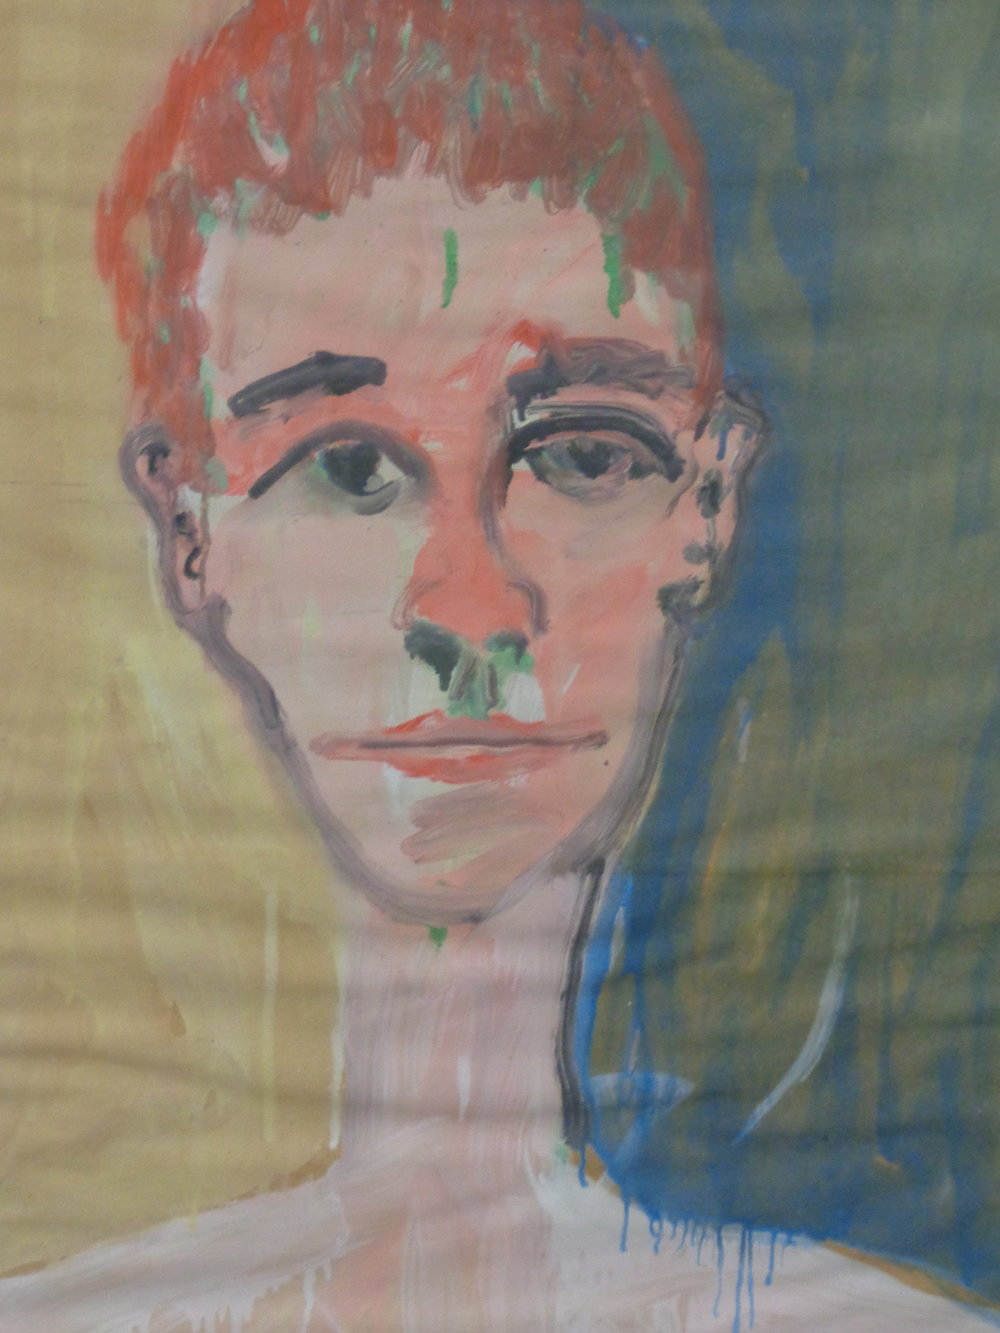 Siobahn Staring - Oil on Paper 2013